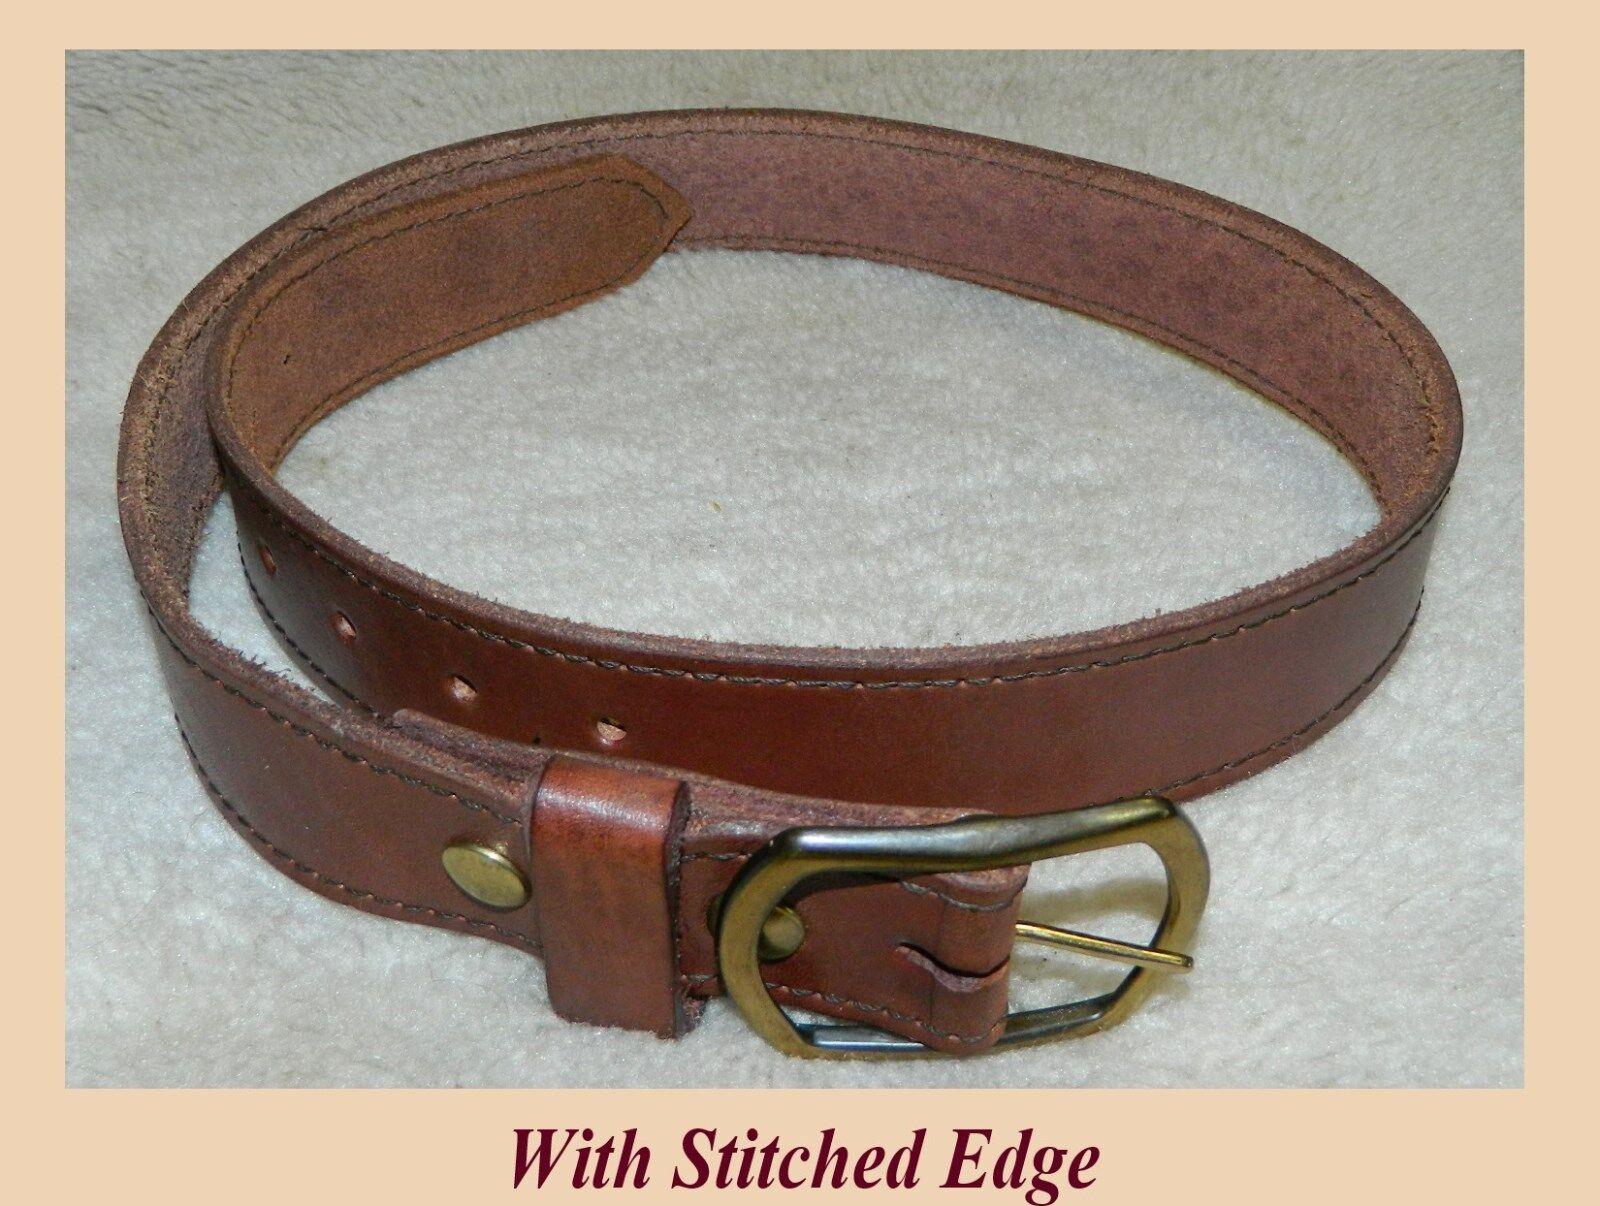 GUN or WORK Belt  9-10 oz Leder Größe 34, 1-1/2